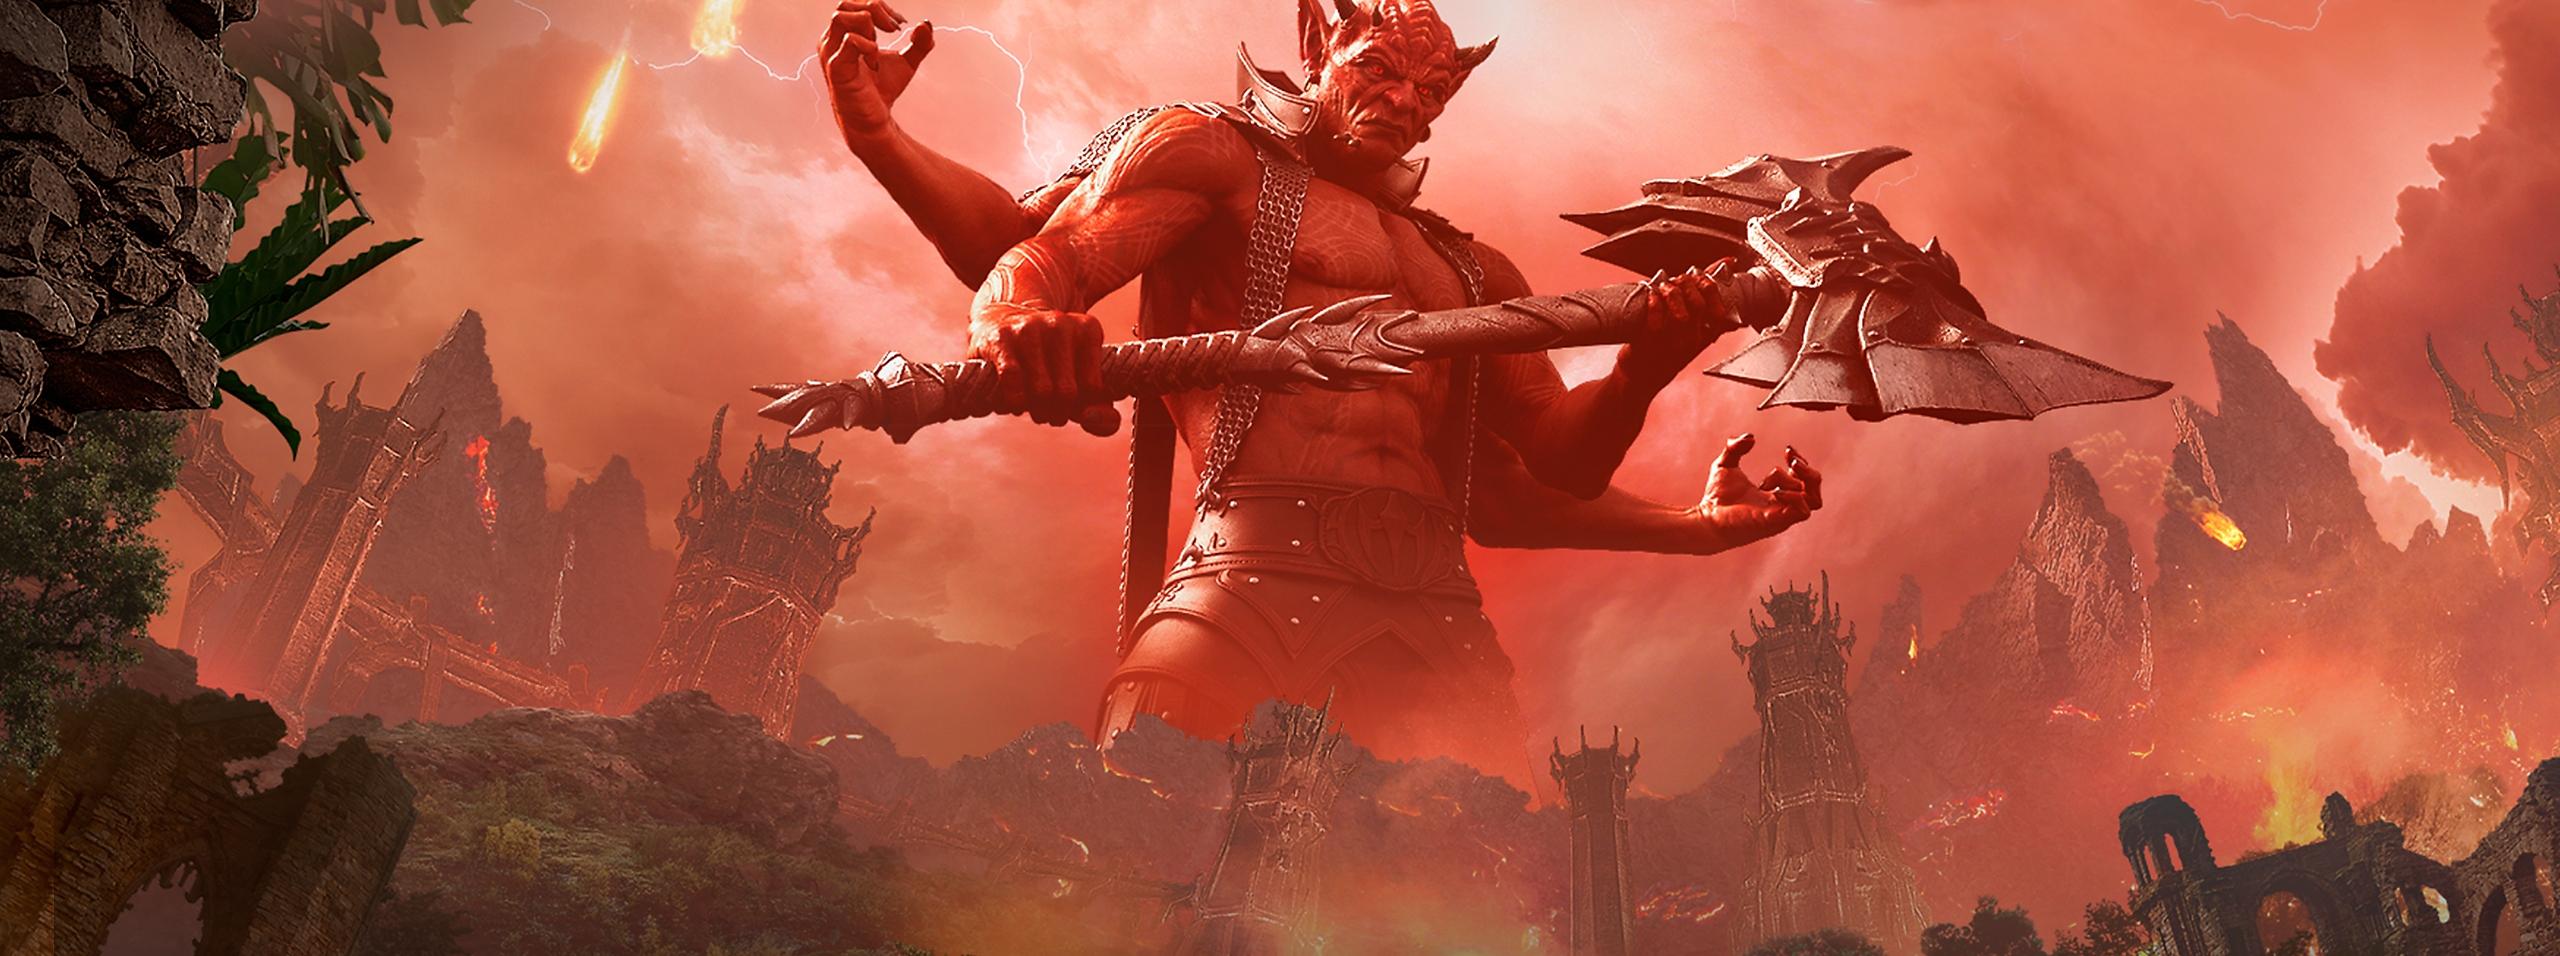 The Elder Scrolls Online: Blackwood - Key Art